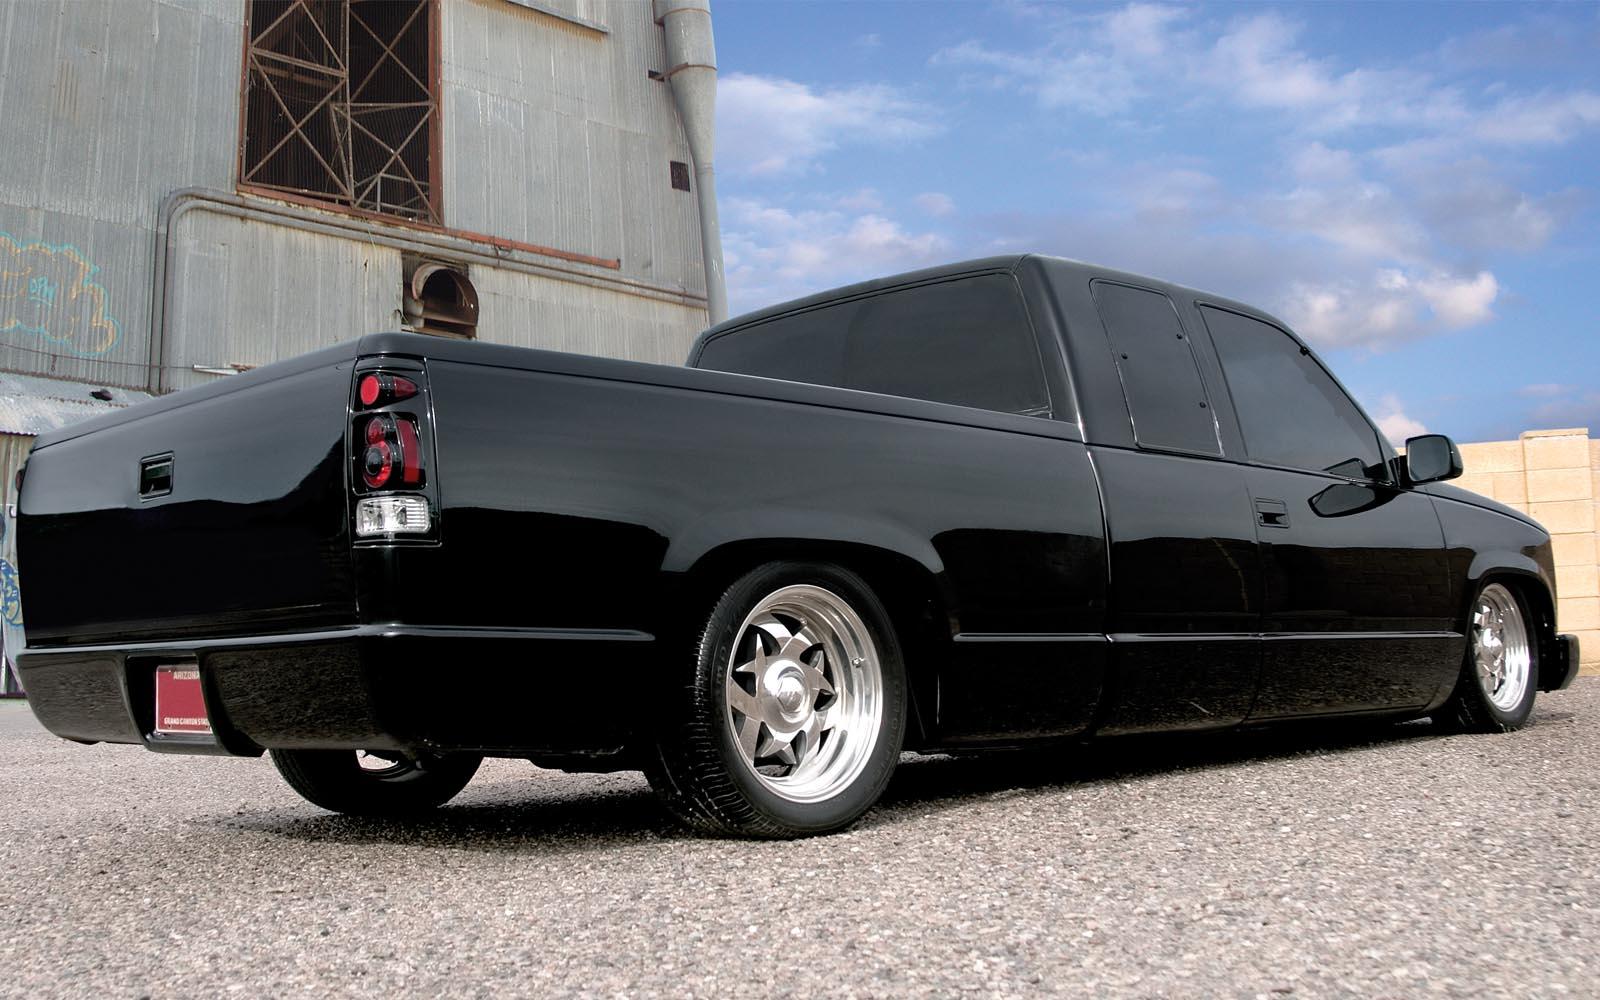 Silverado 95 chevy silverado : Chevrolet Silverado Extra Cab 1988-2006 ThunderForm Custom ...